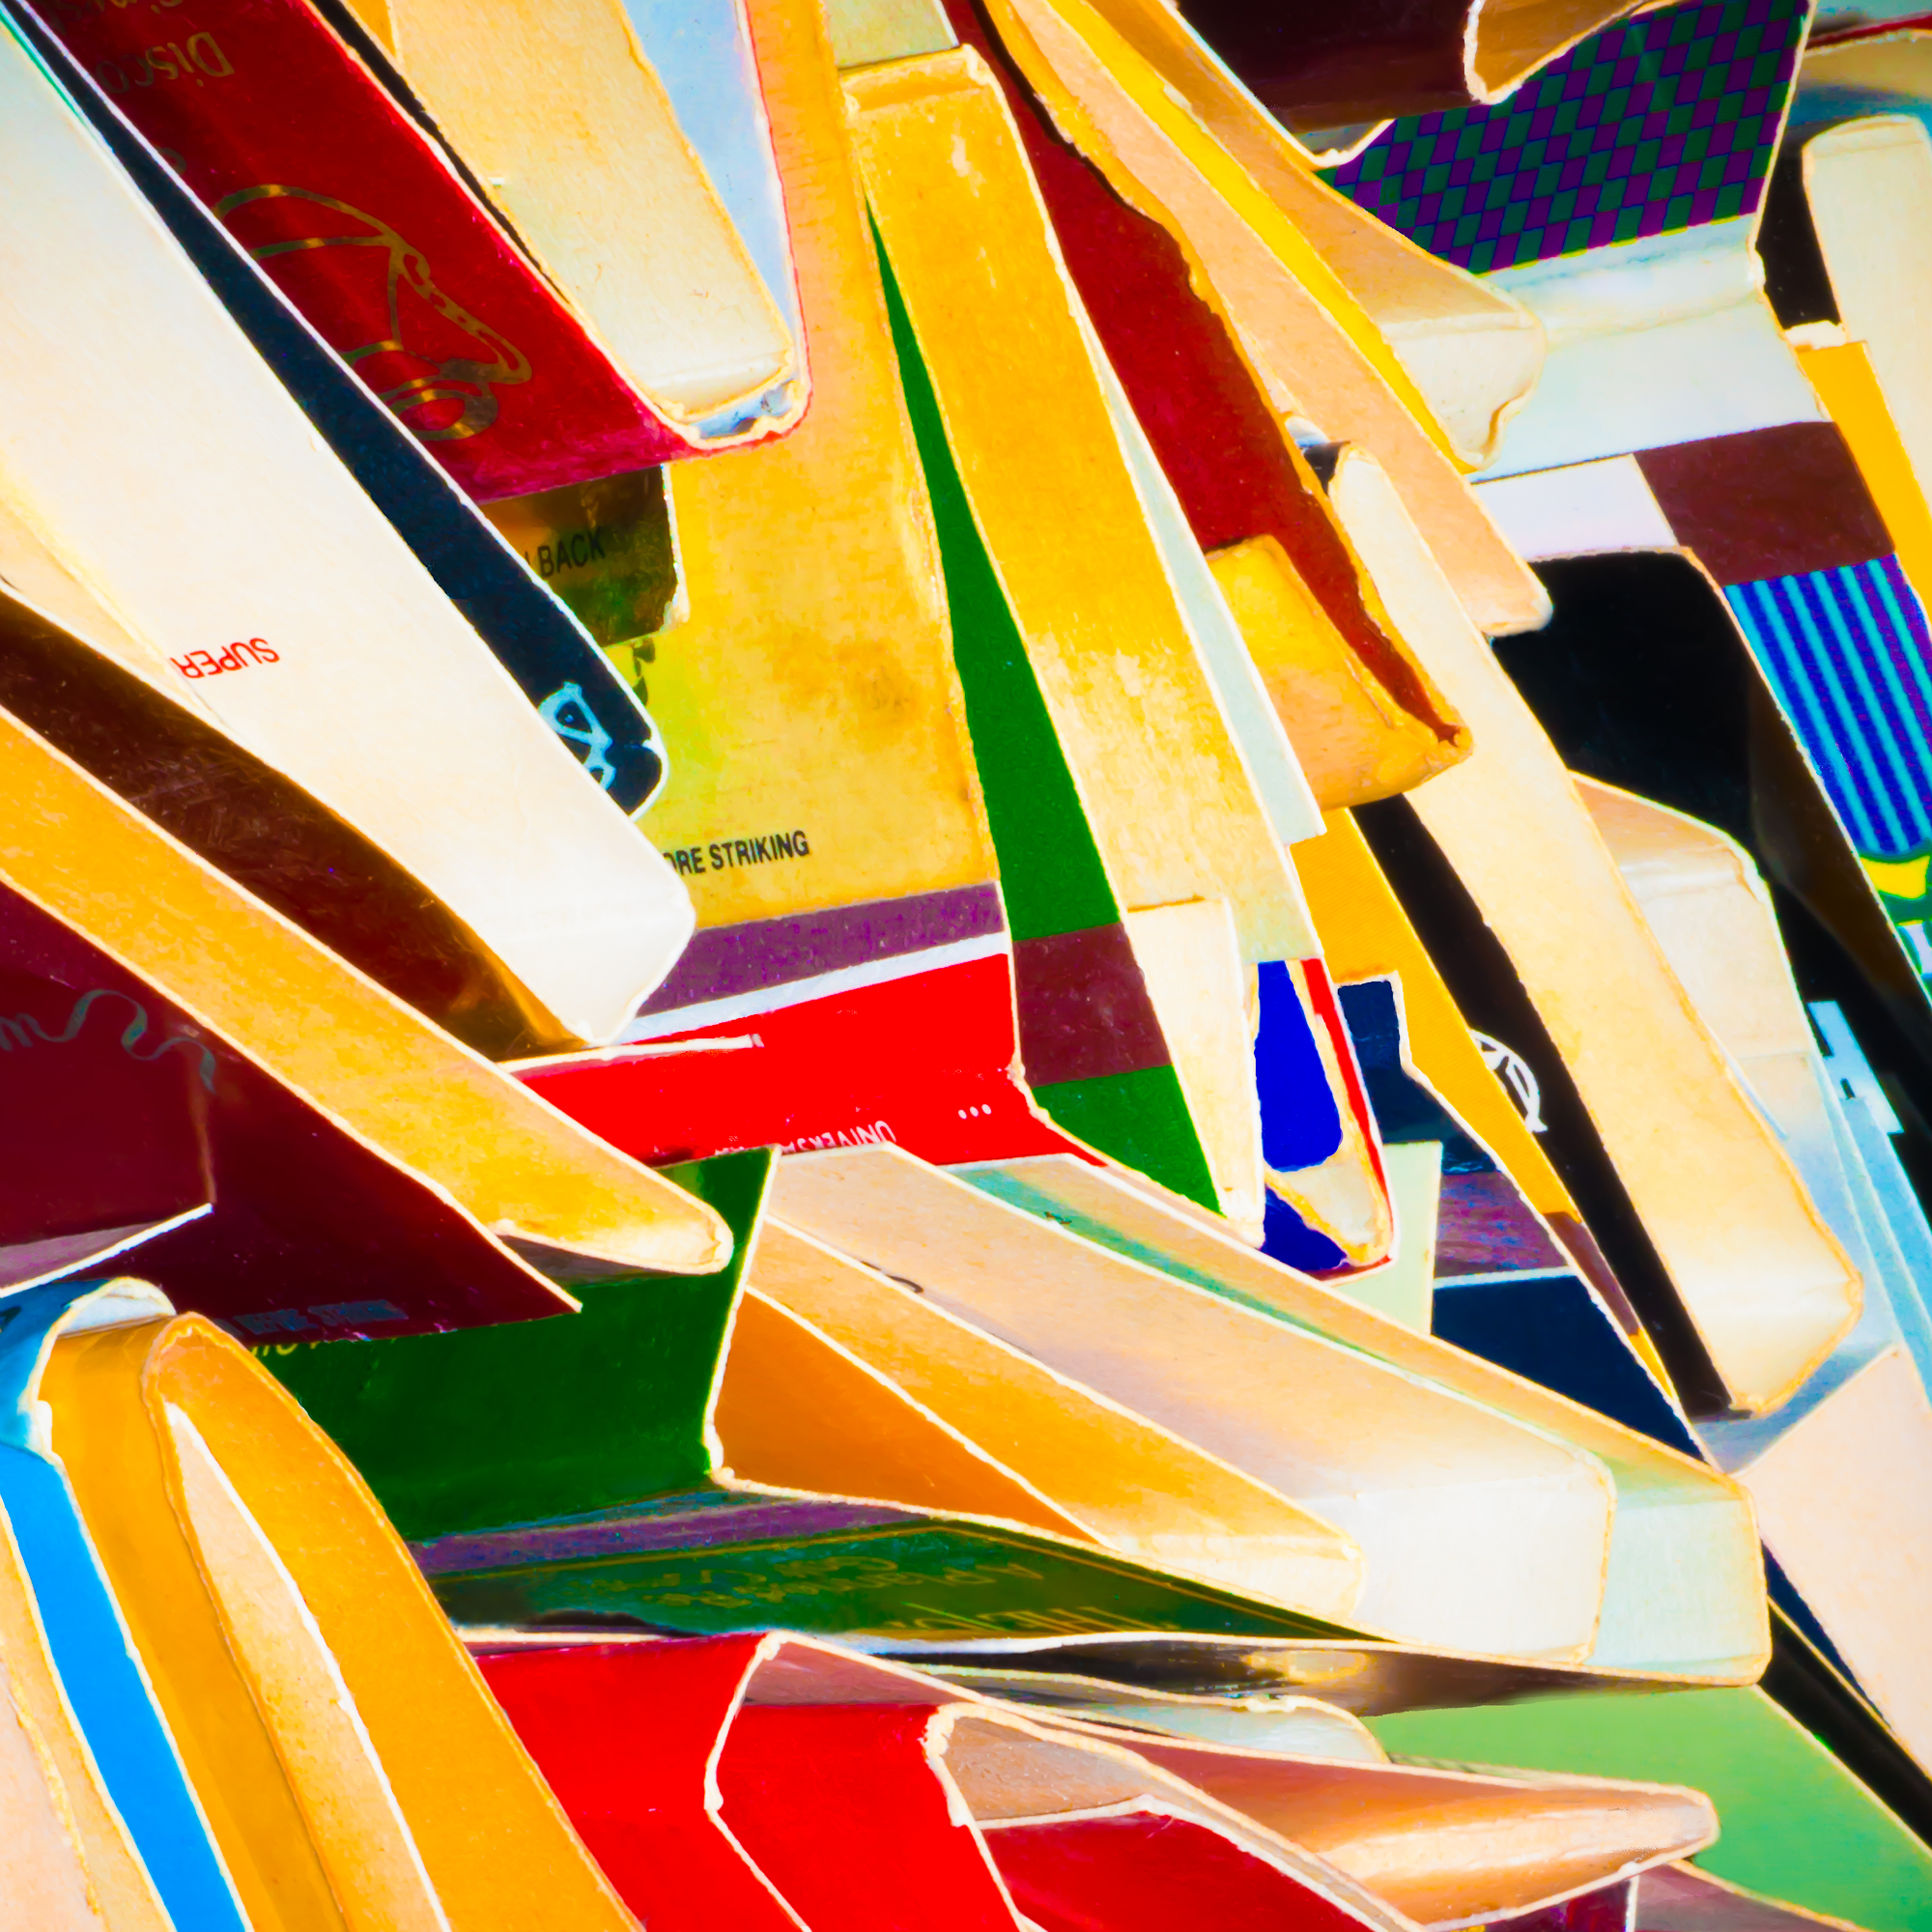 Super Striking   Dye sublimation on aluminum  20 x 20 inches  2015  © Rosalie Rosenthal